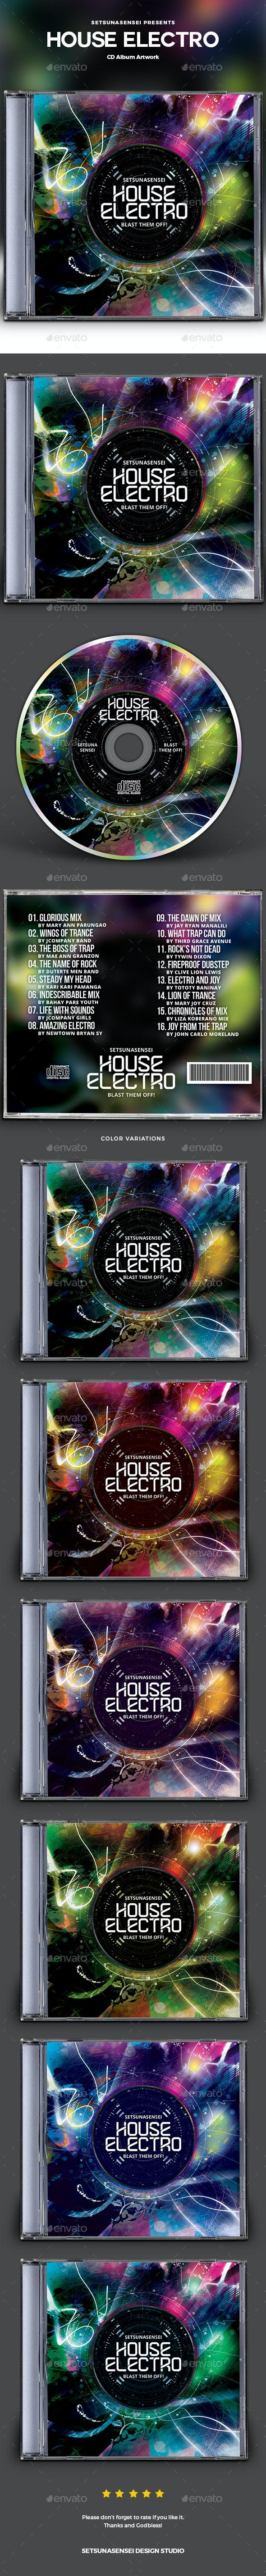 House Electro CD Album Artwork - CD & DVD Artwork Print Templates